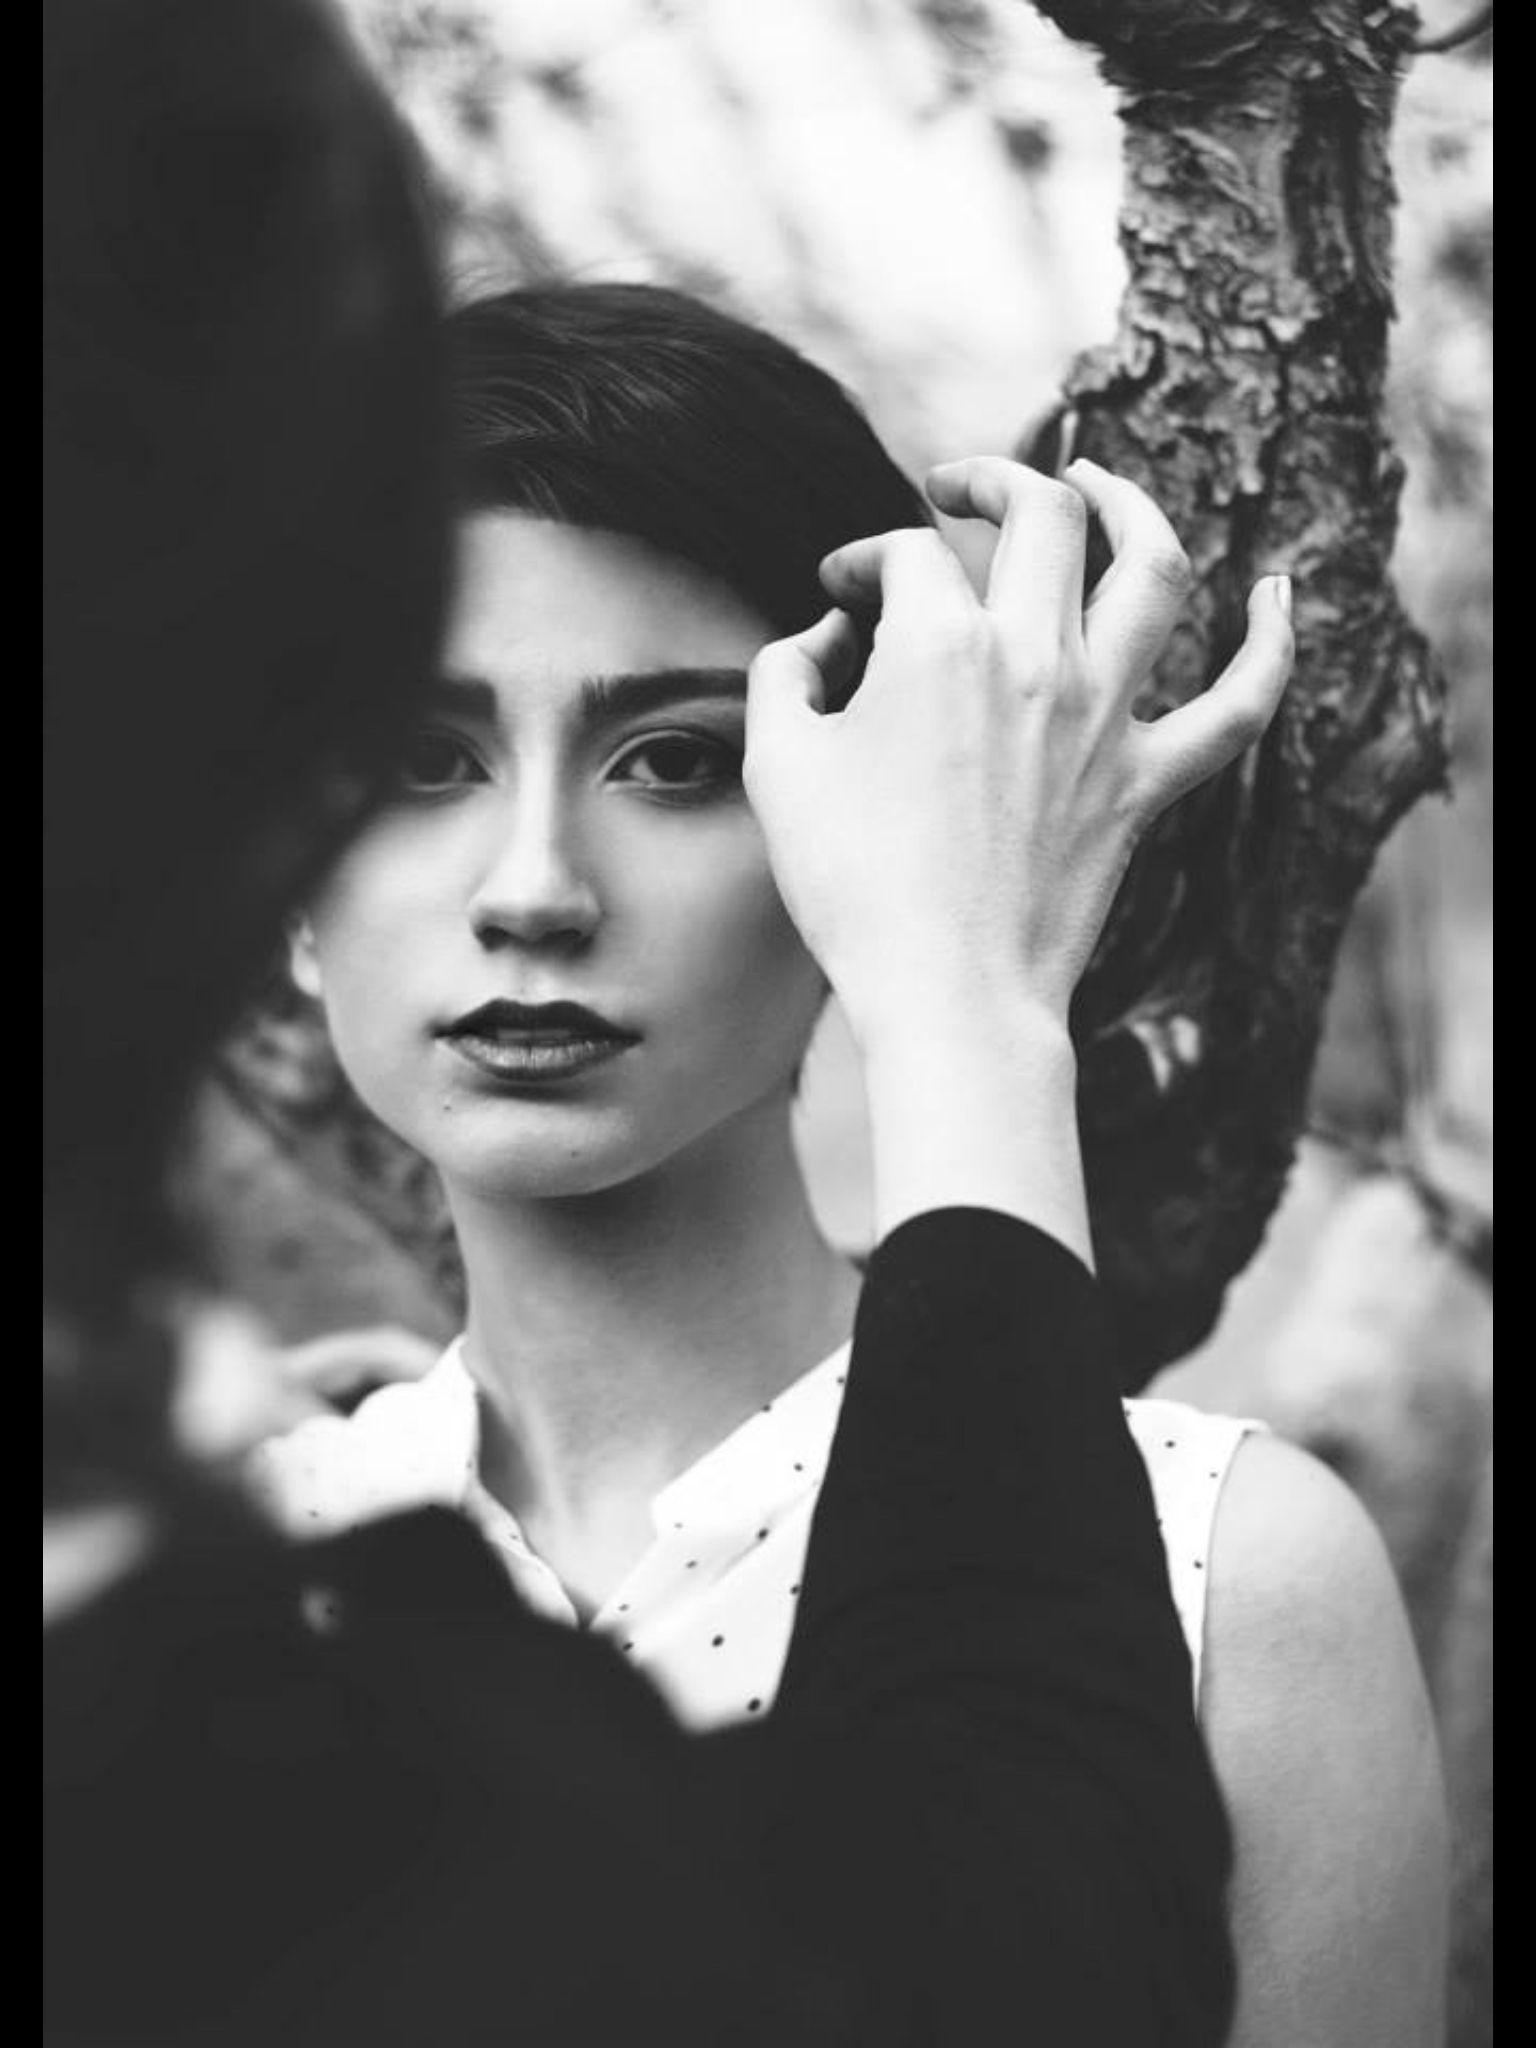 Photo Mona mahpeyma